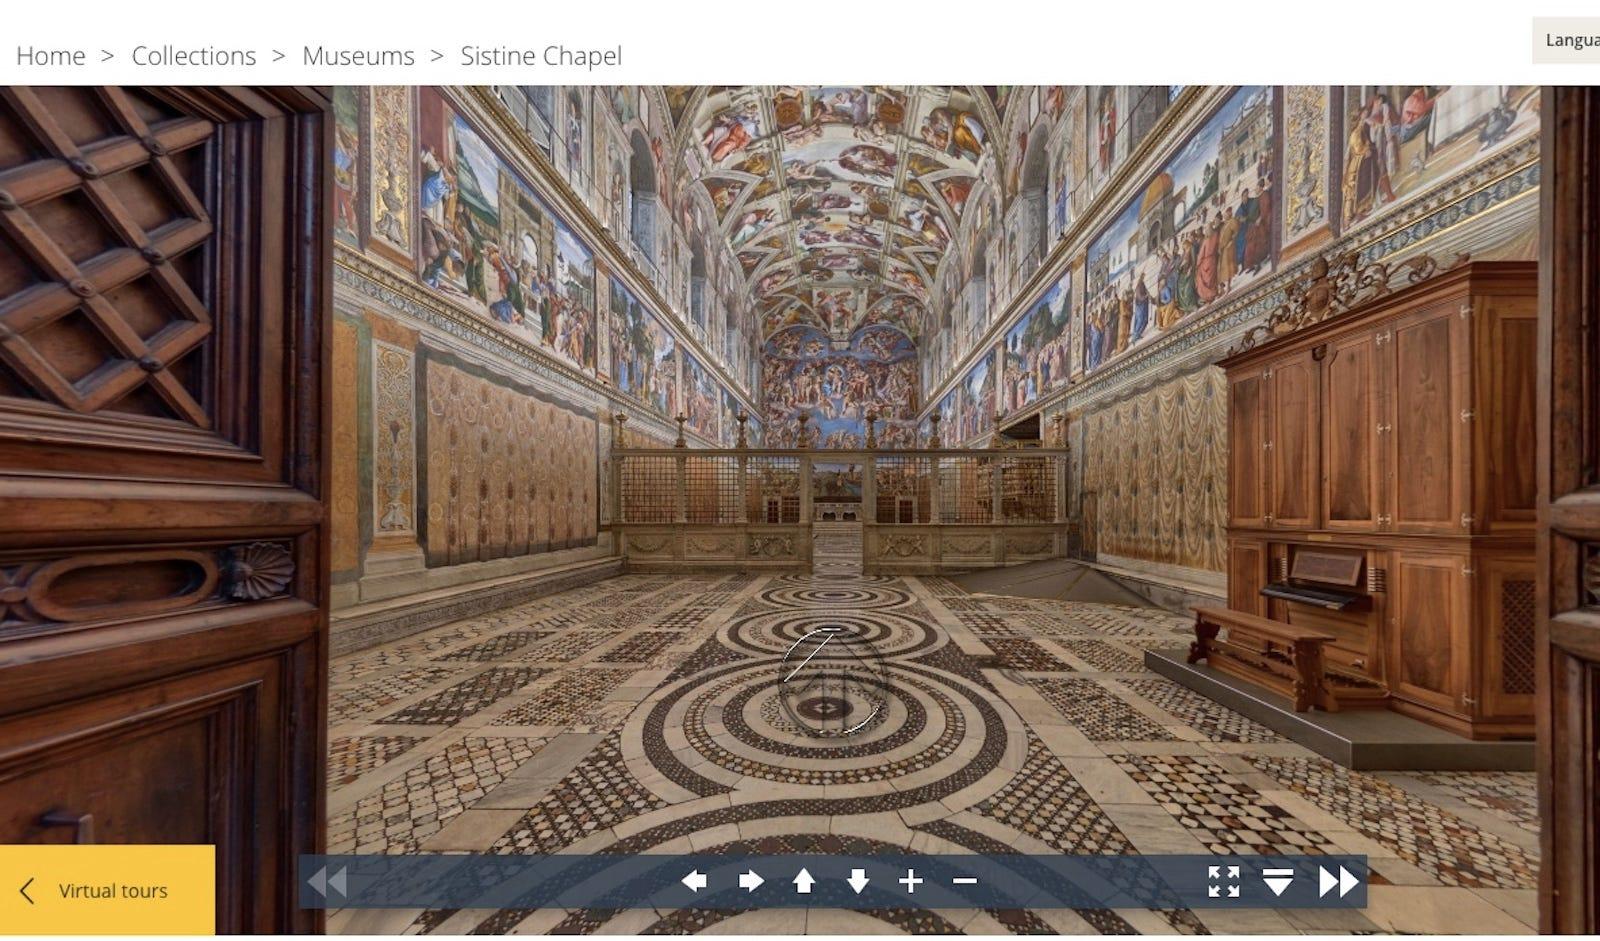 The entrance to the Sistine Chapel via a virtual tour.